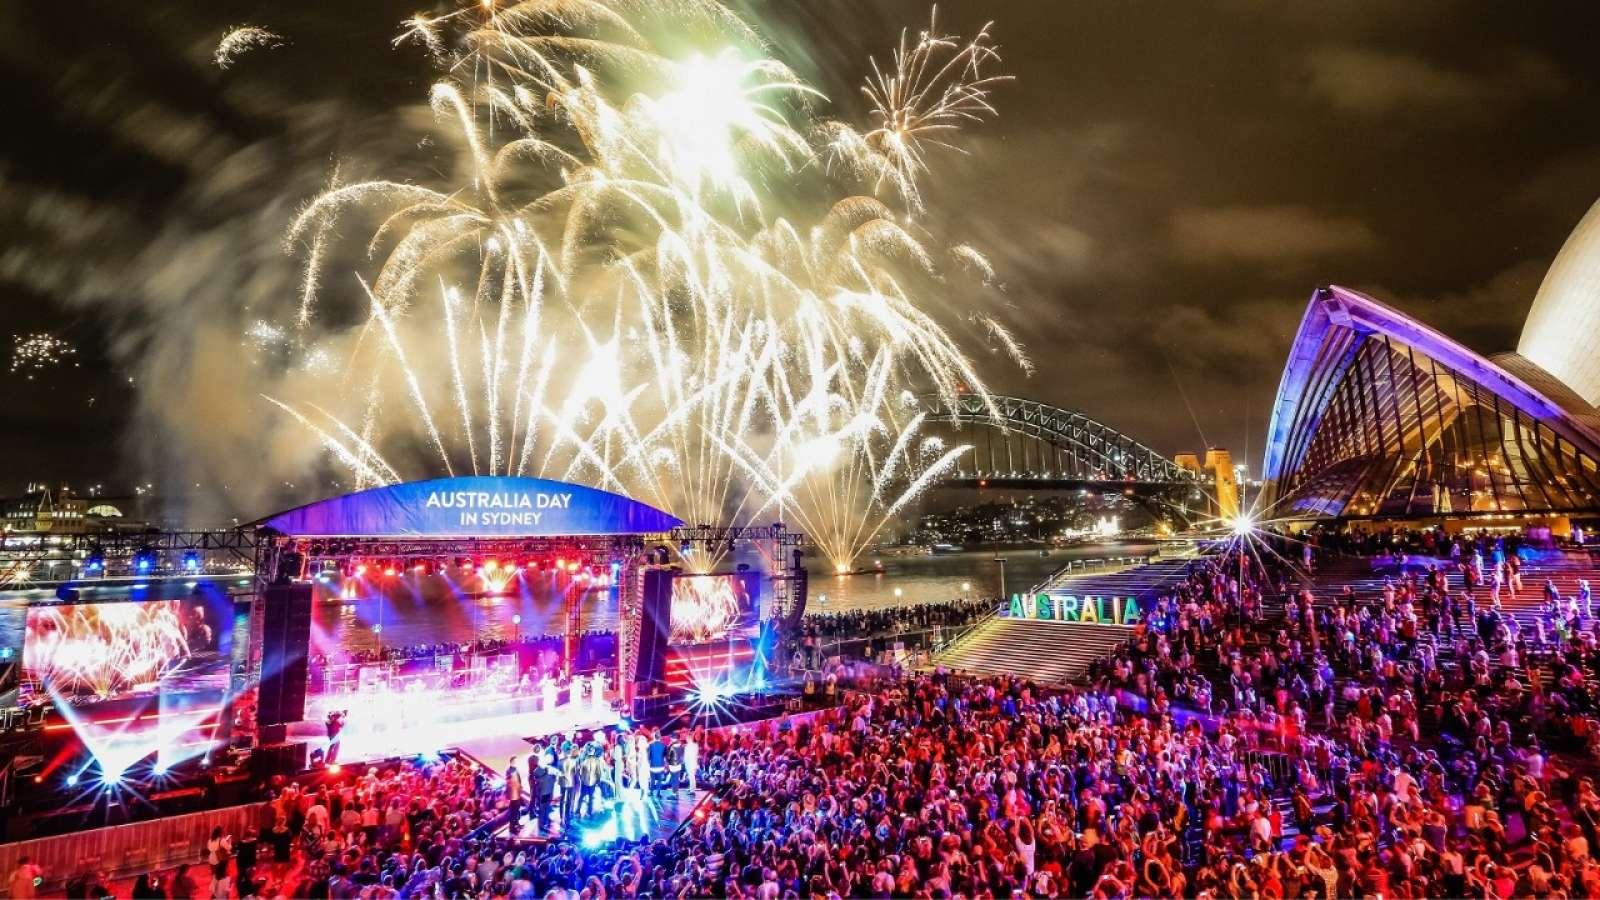 Australia Day celebrations at Sydney Opera House.